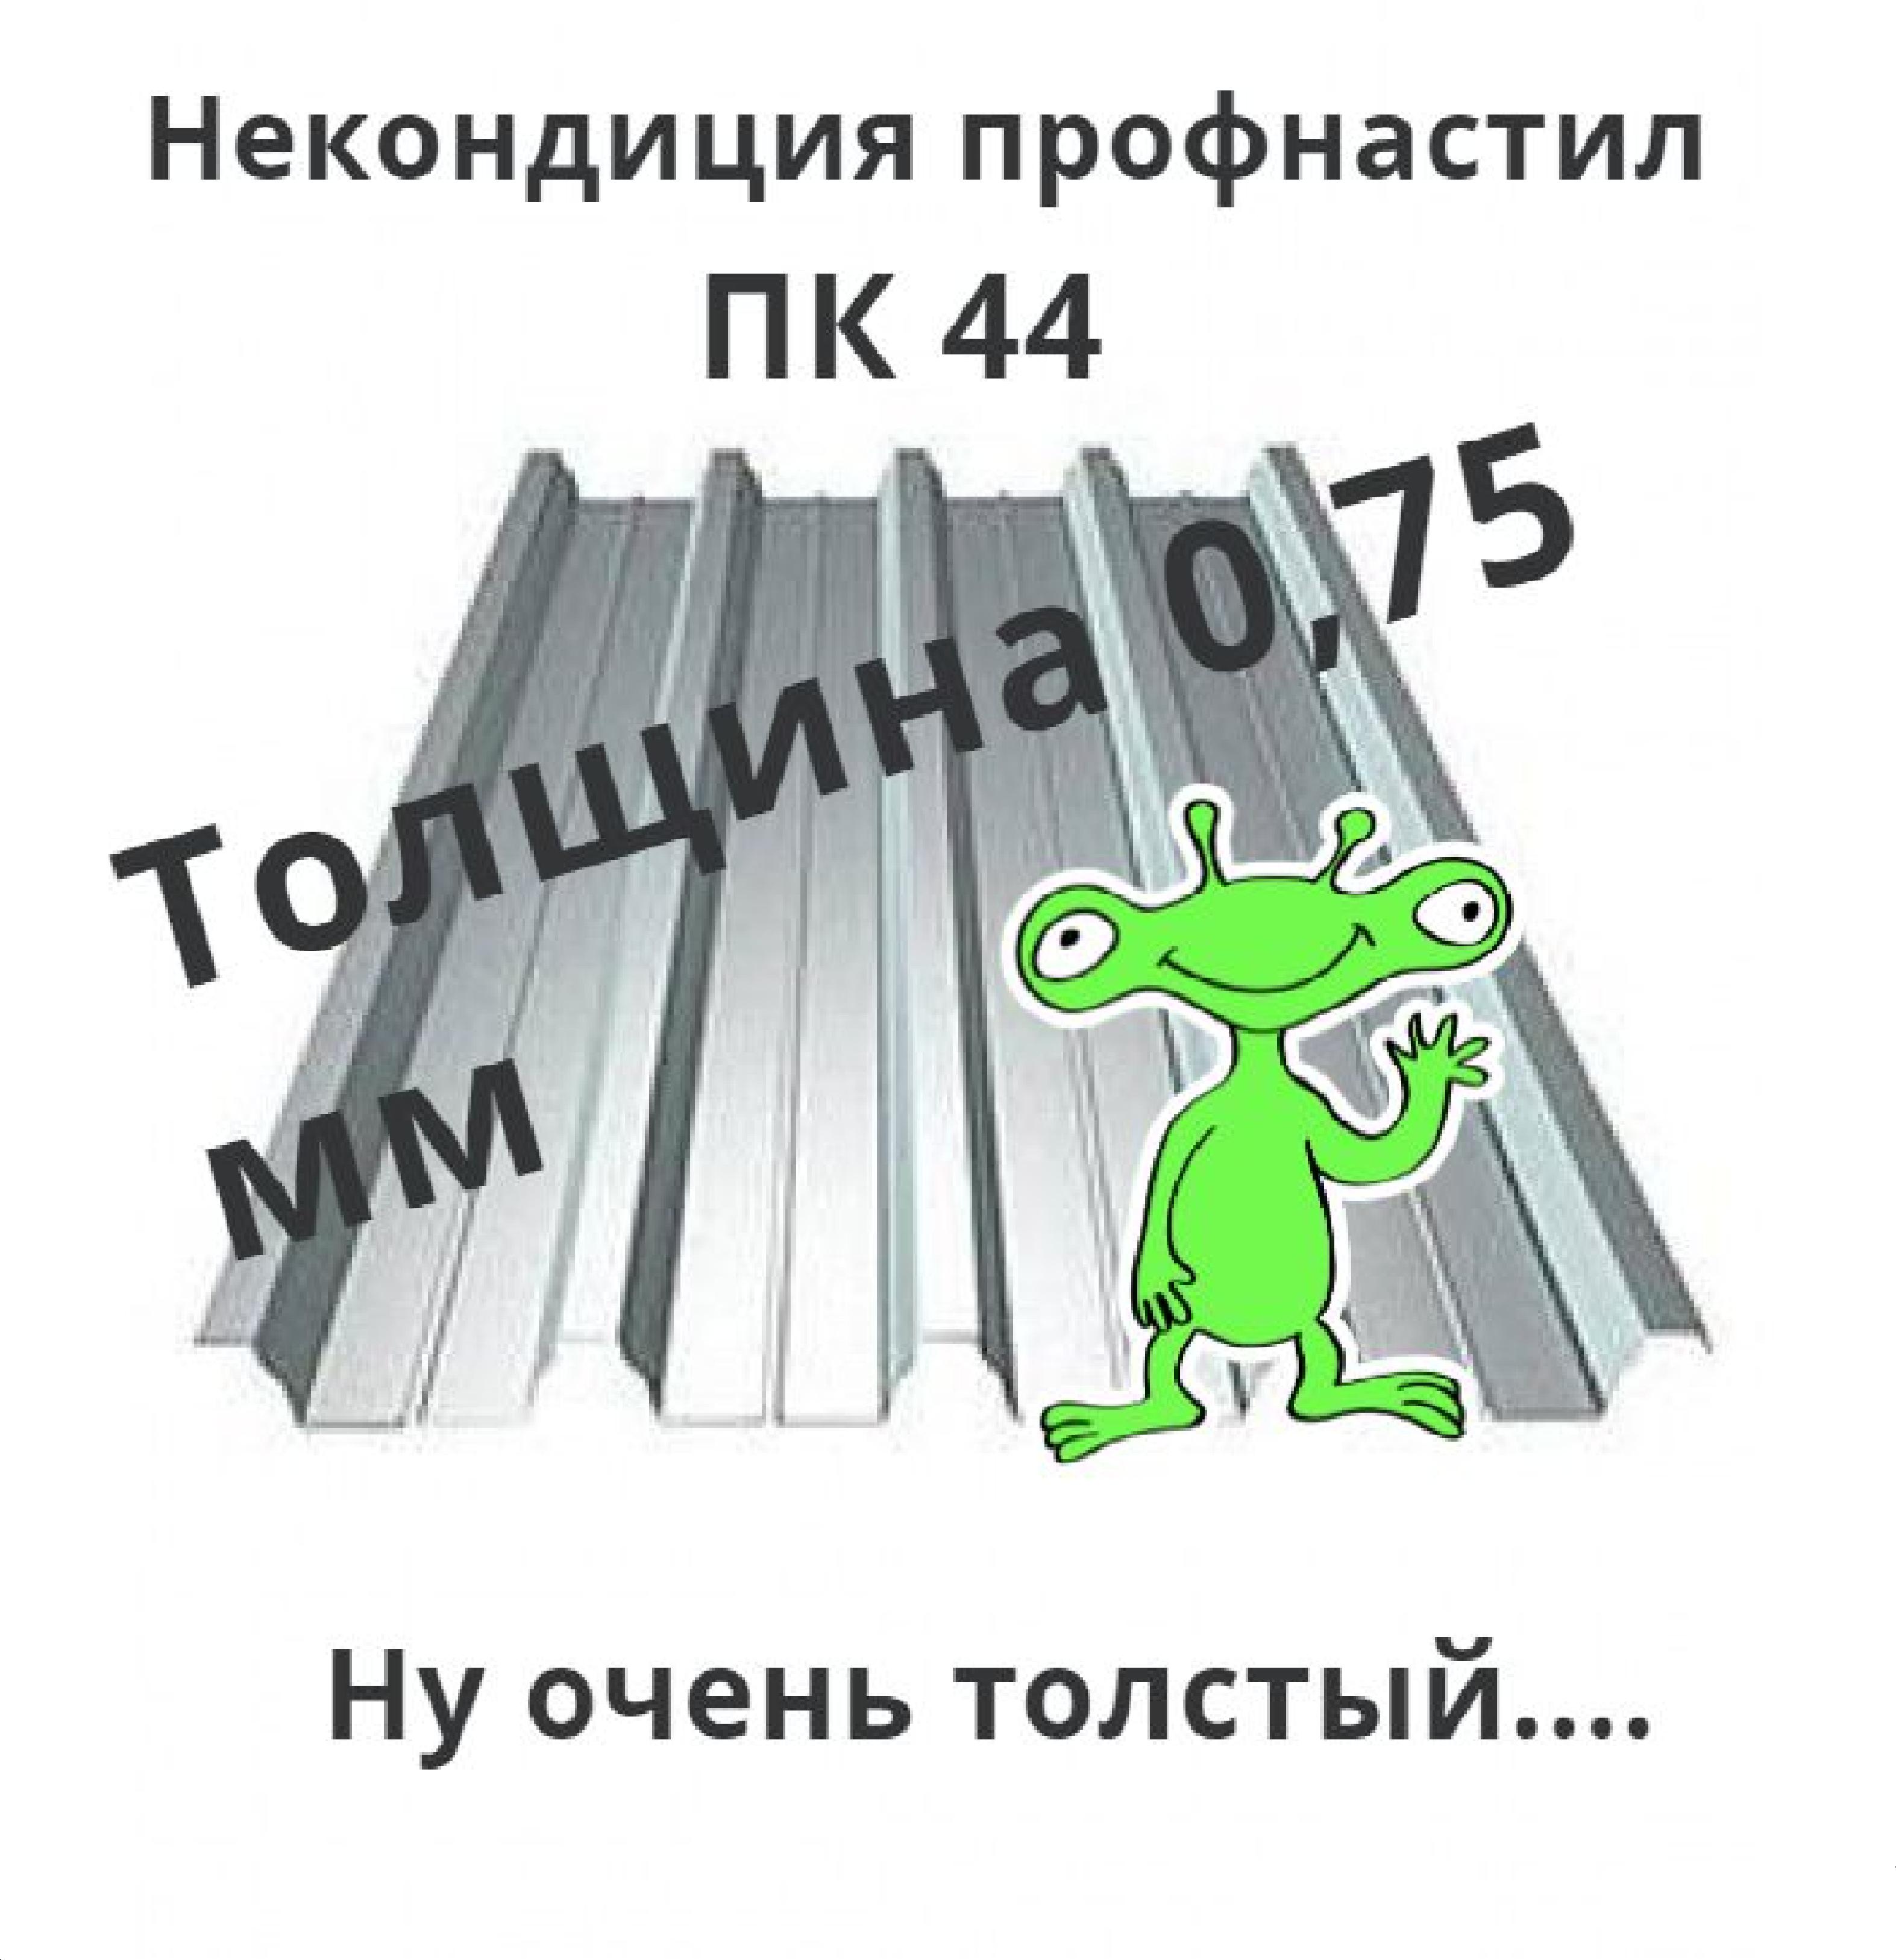 пге7е7